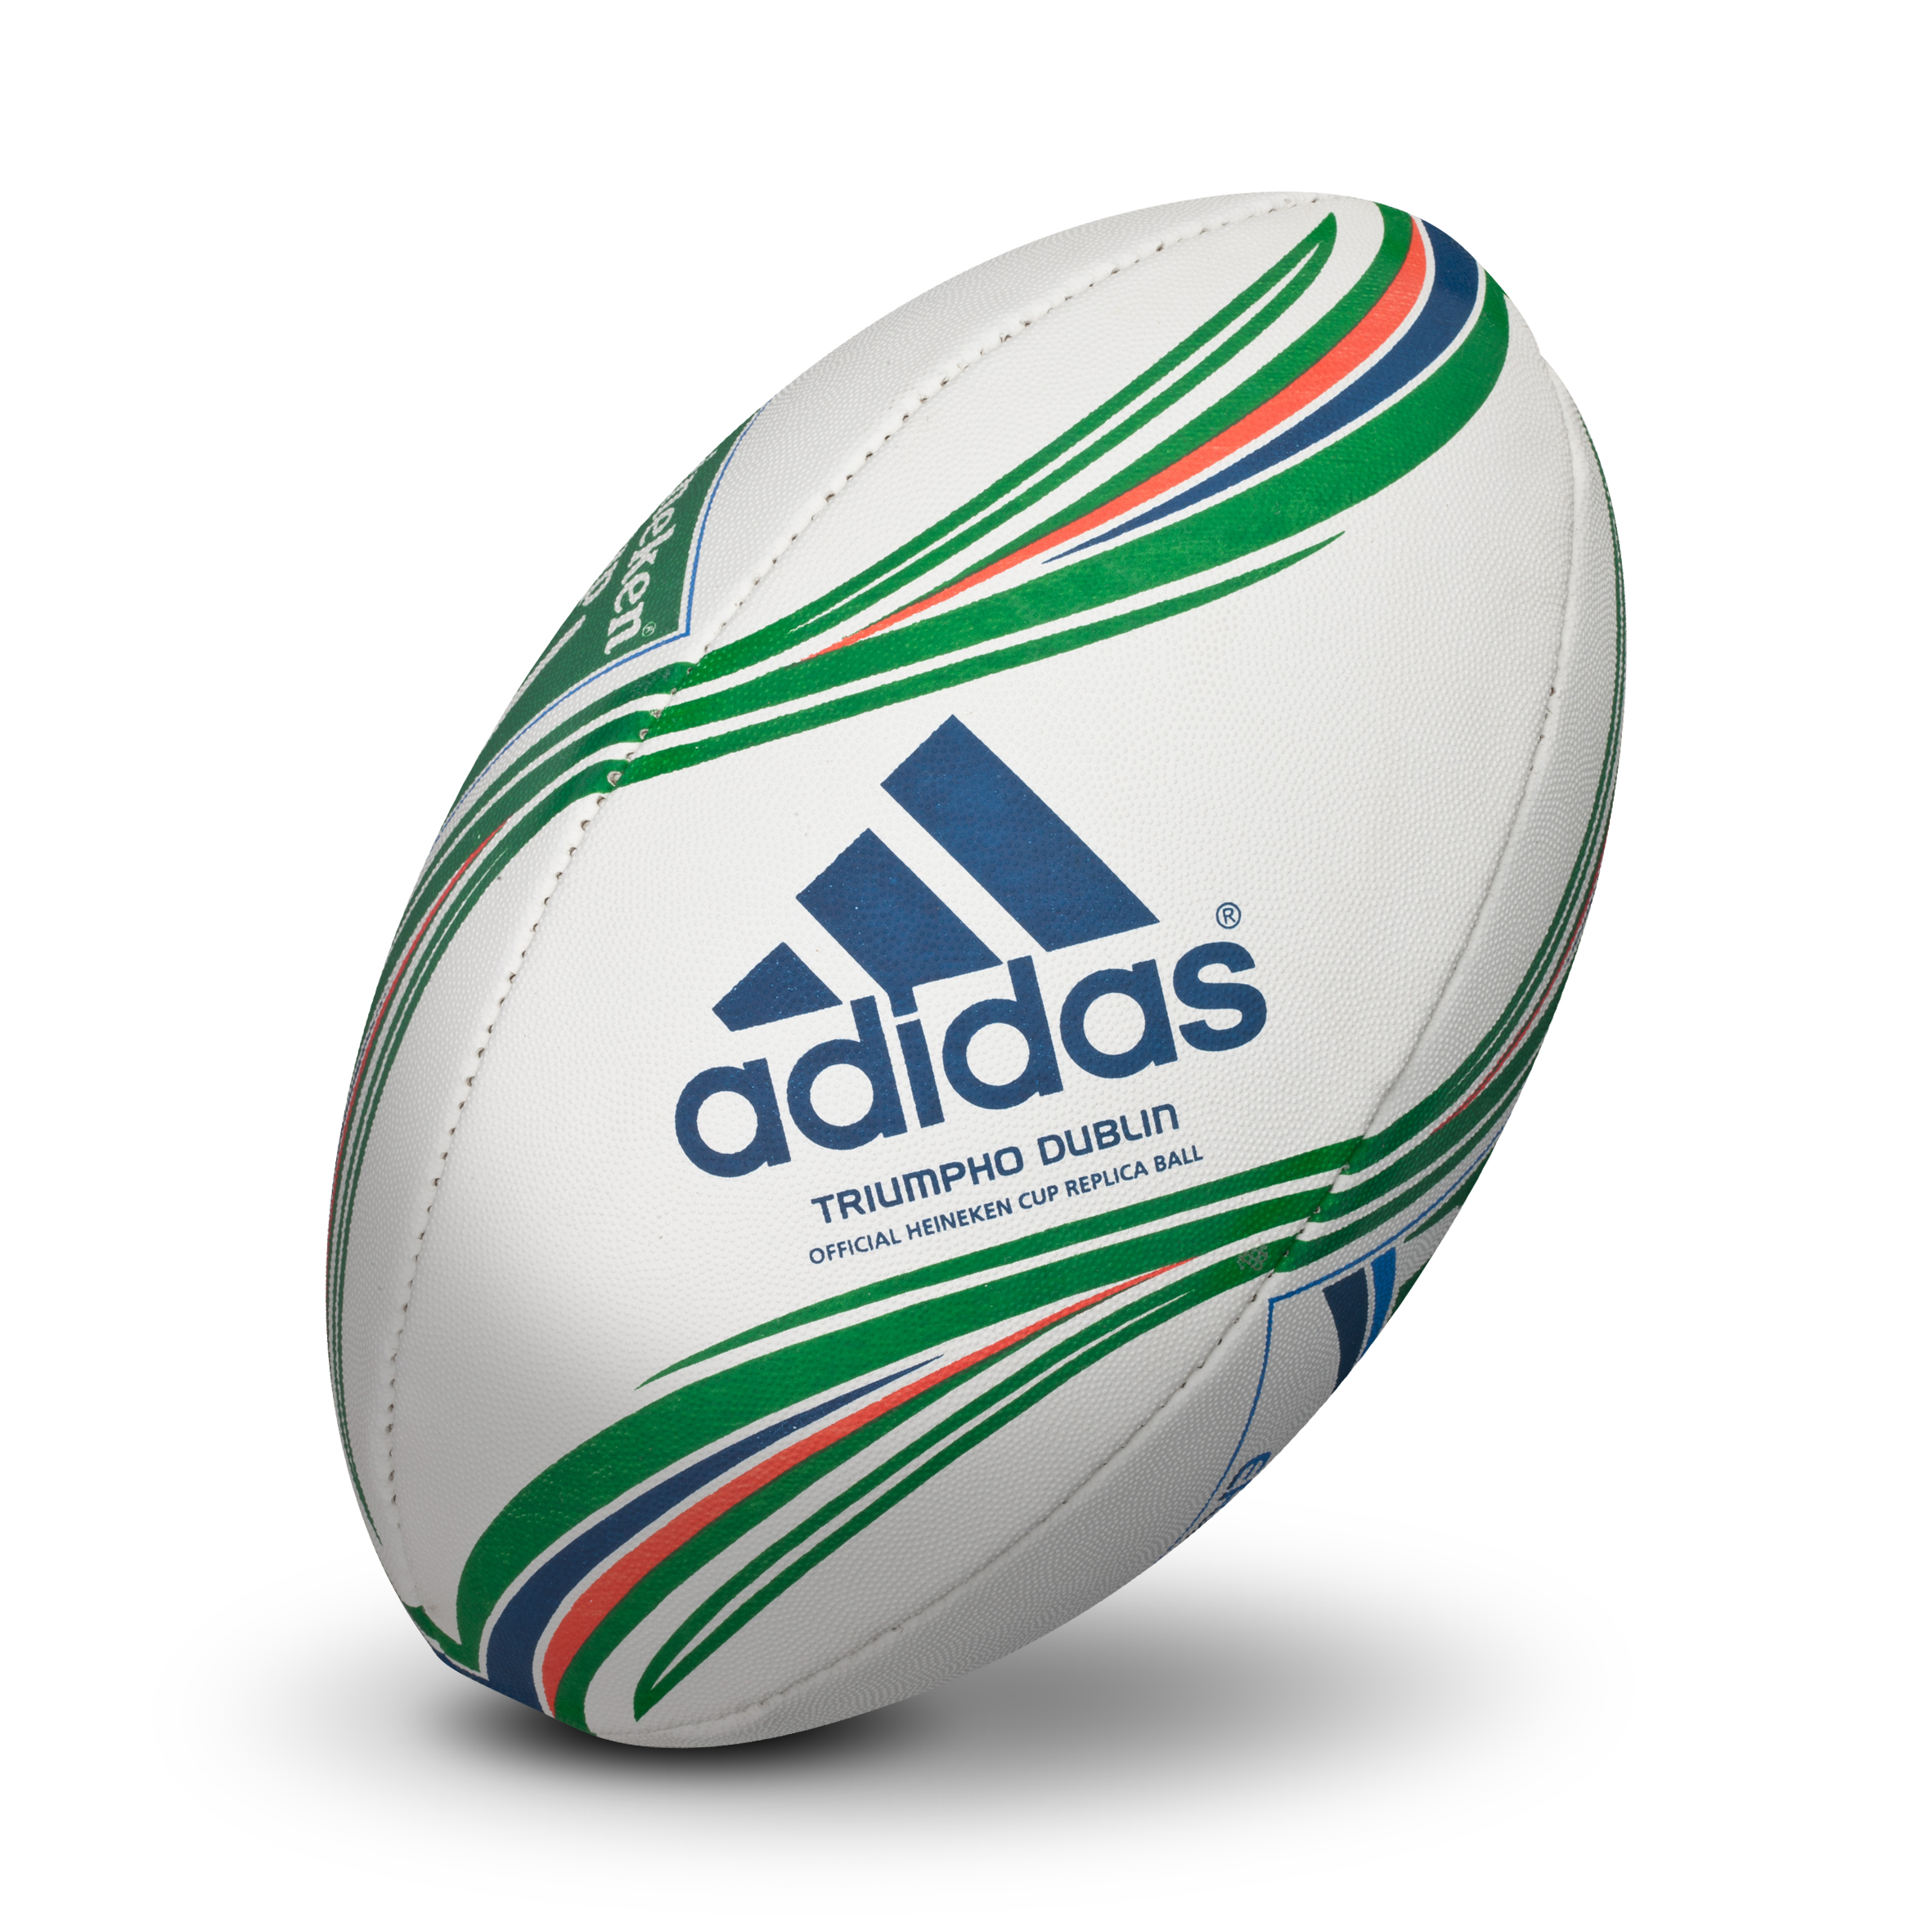 Adidas Heineken Cup Replica Rugby Ball - White